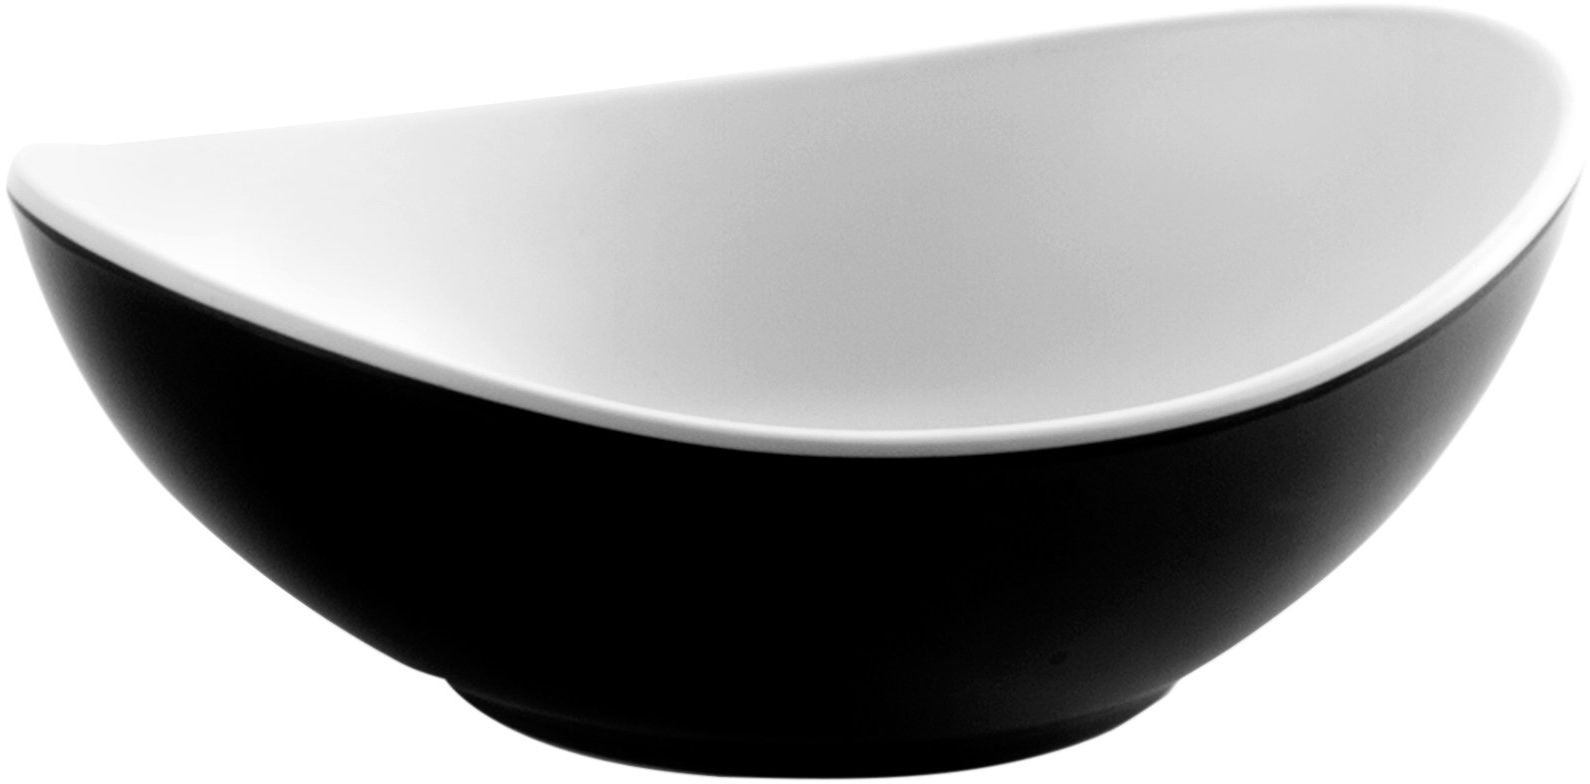 Lacor owalna Melamina Fuji Bowl, czarna, 18 x 13 x 6 cm